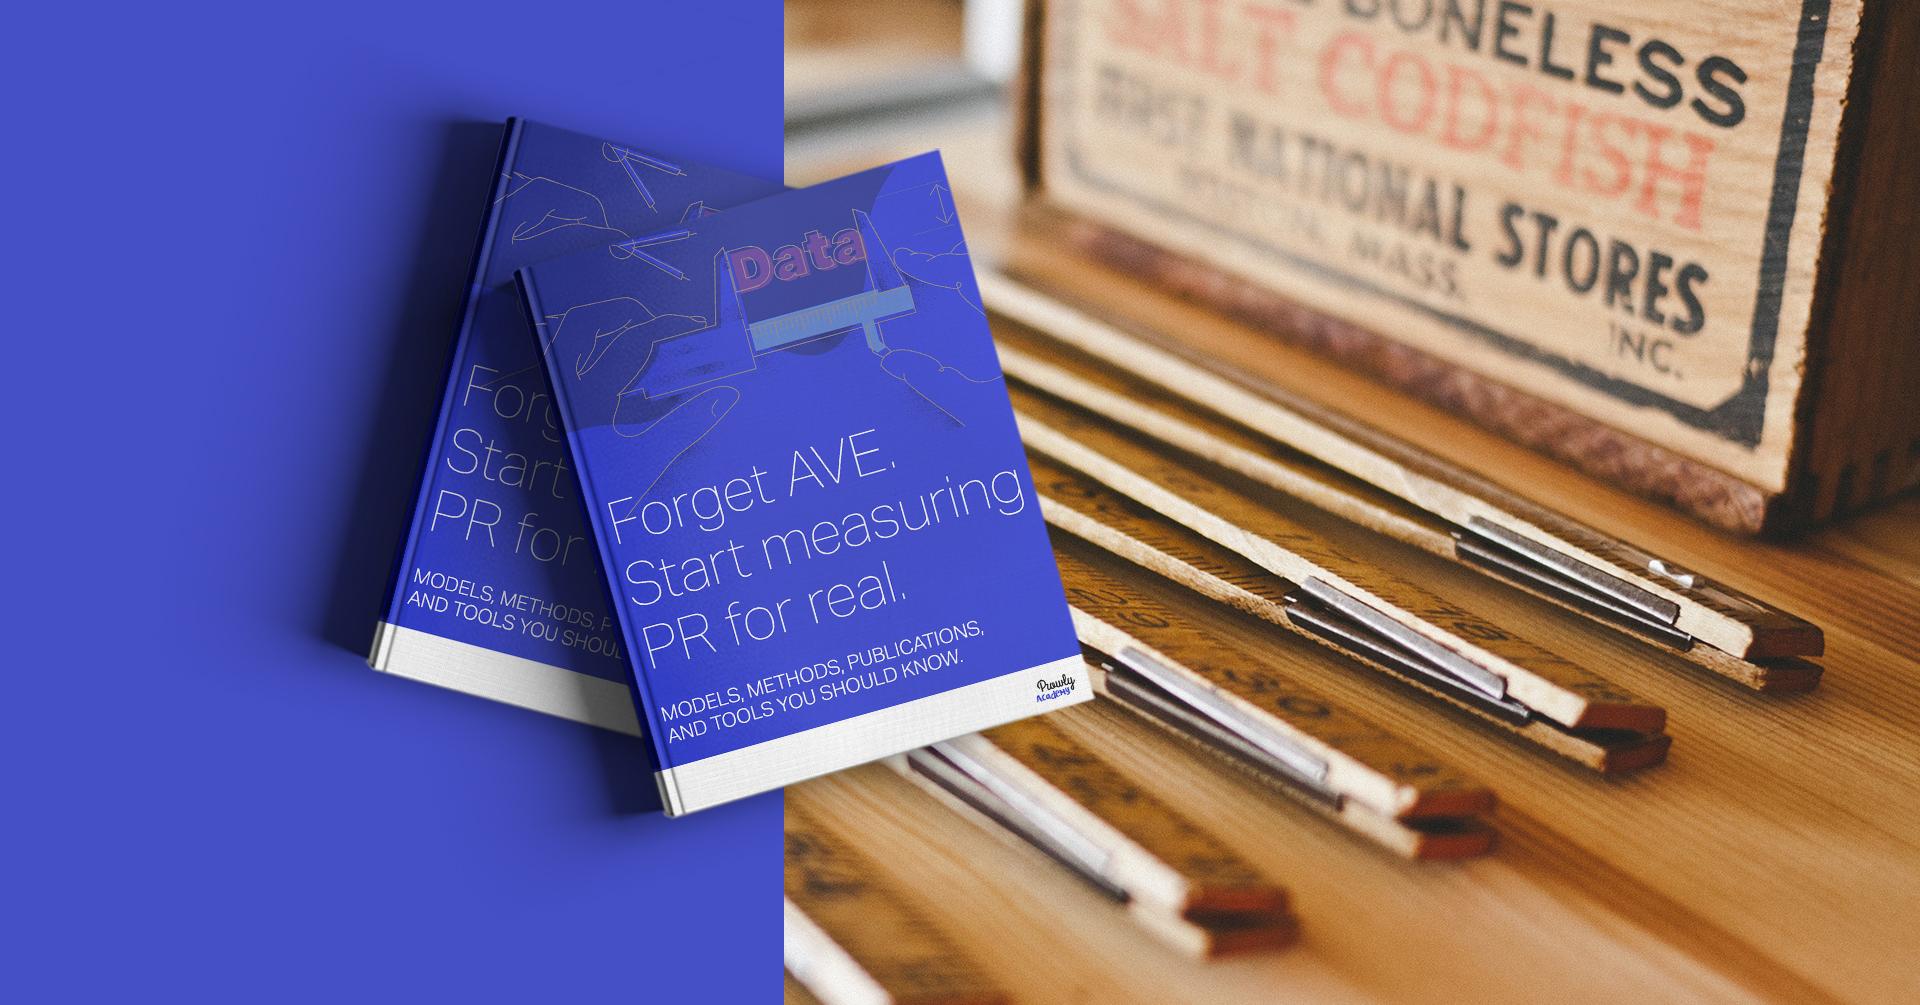 Forget AVE. Start measuring PR for real!